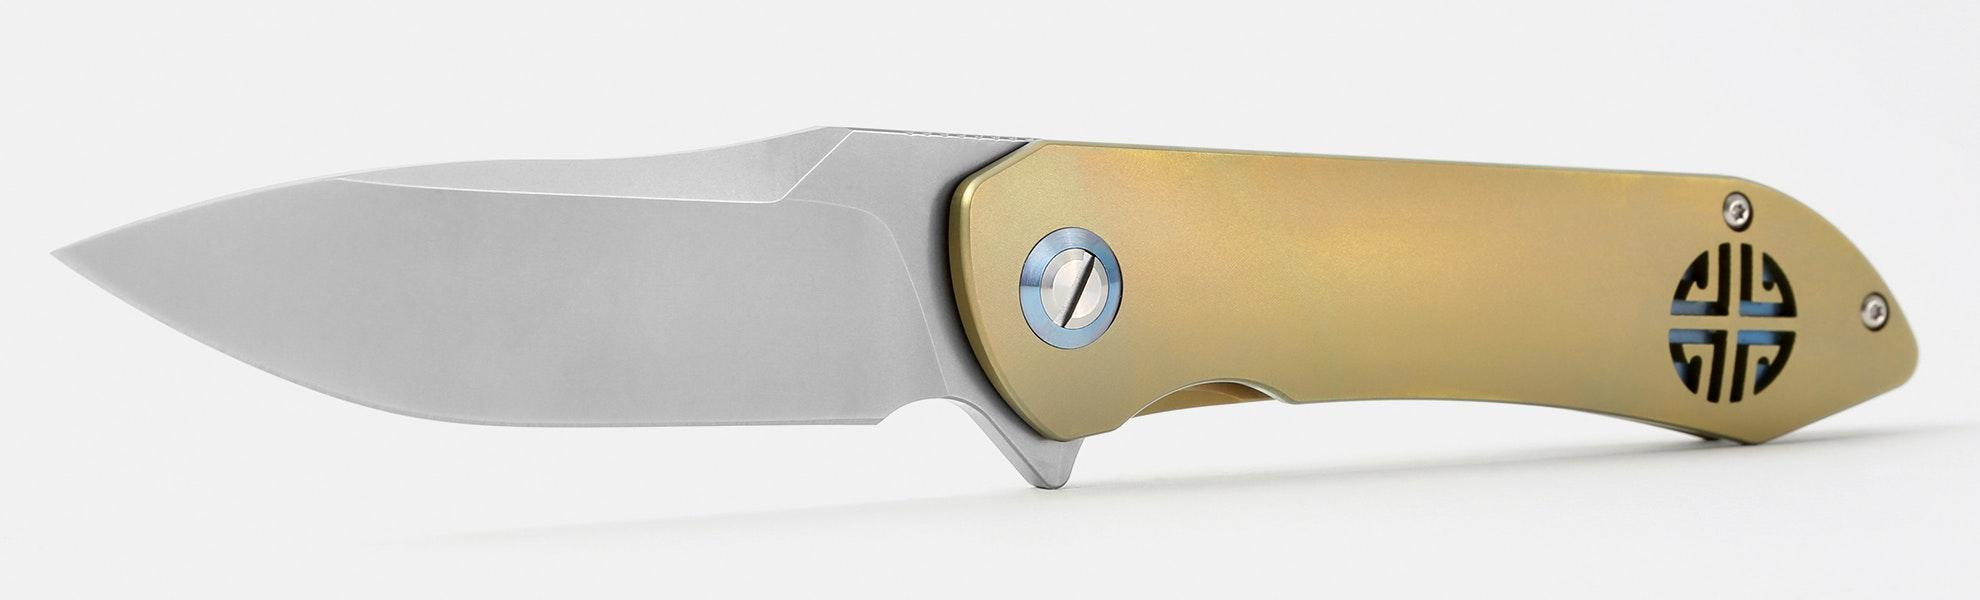 Bestech Knives 1703 Titanium Frame Lock w/S35VN